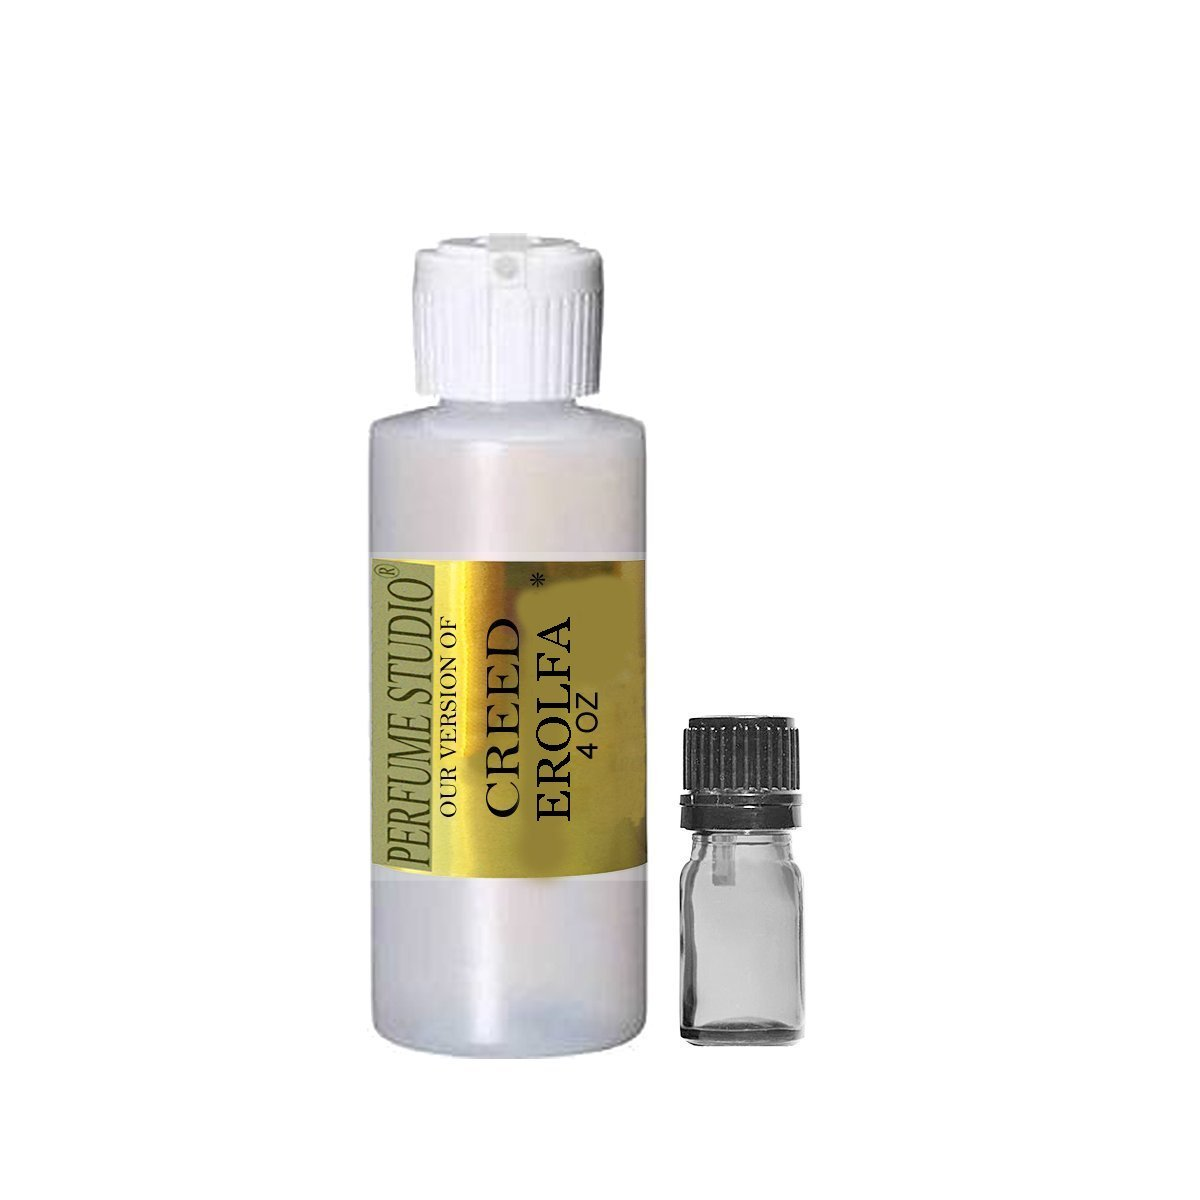 Premium IMPRESSION Perfume Oil Wholesale, SIMILAR Fragrance Accords to Famous Designer Brands - 100% Pure Undiluted, No Alcohol, Free 5ml Empty Glass Euro Dropper (CREED EROLFA IMPRESSION, 4OZ)